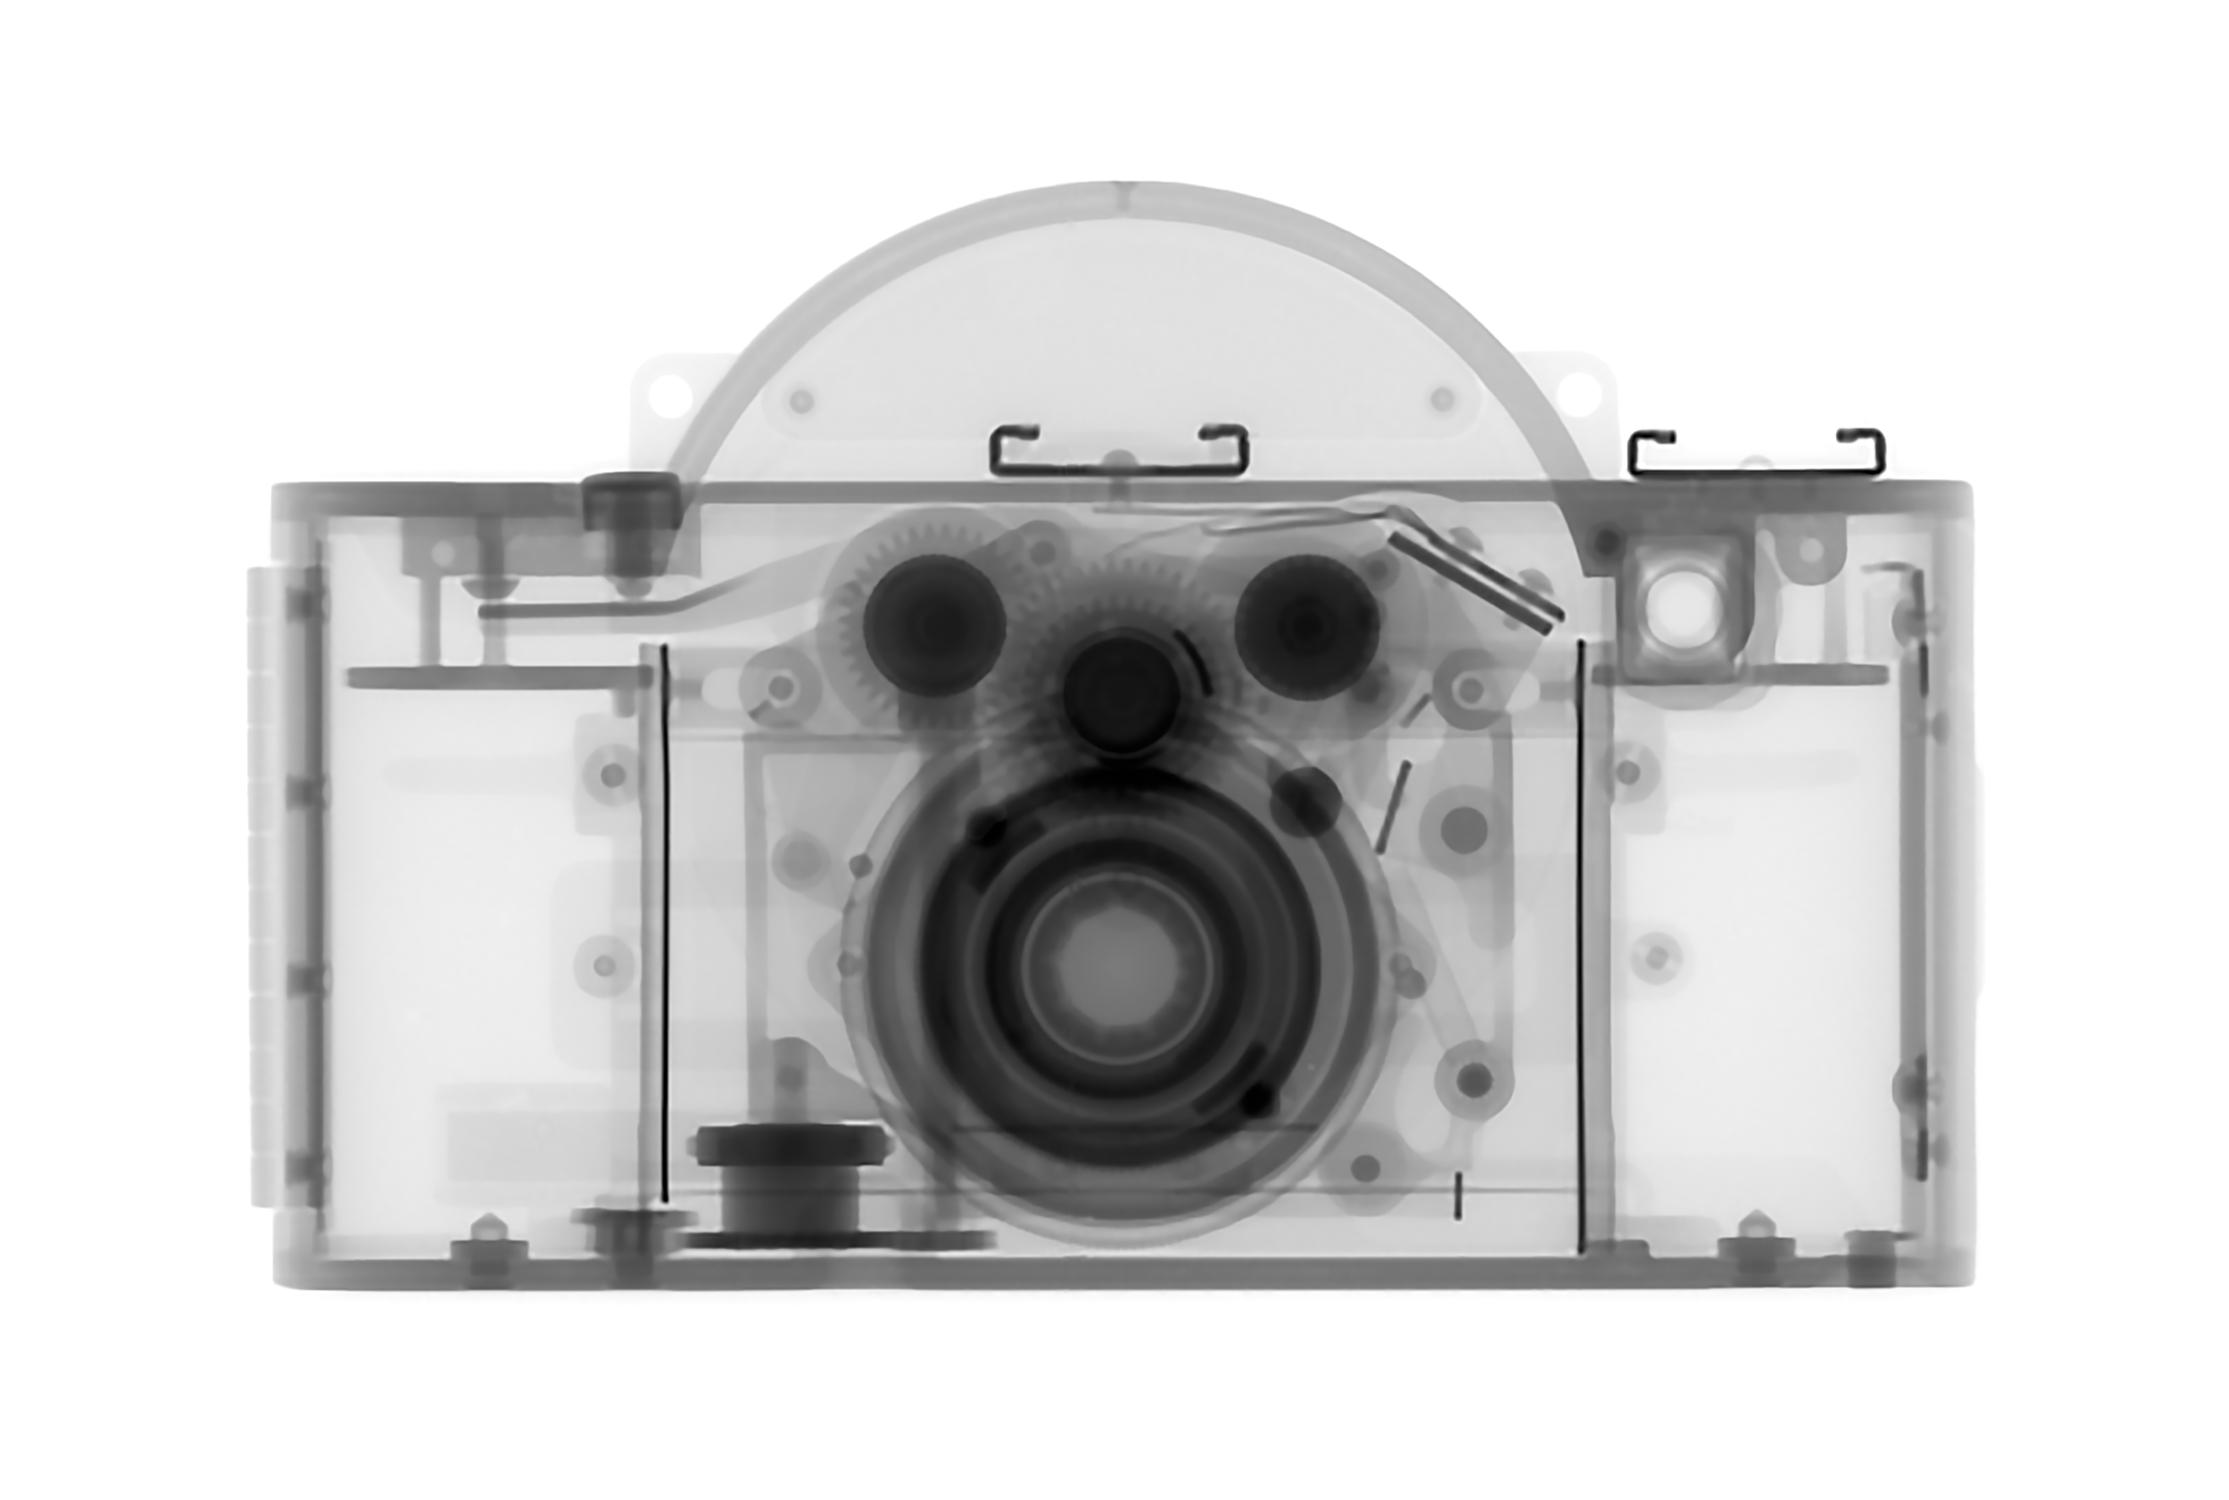 """Univex Mercury I Model CC"" by Kent Krugh, 13x19in, x-ray archival pigment print (2016), $400 | BUY NOW"